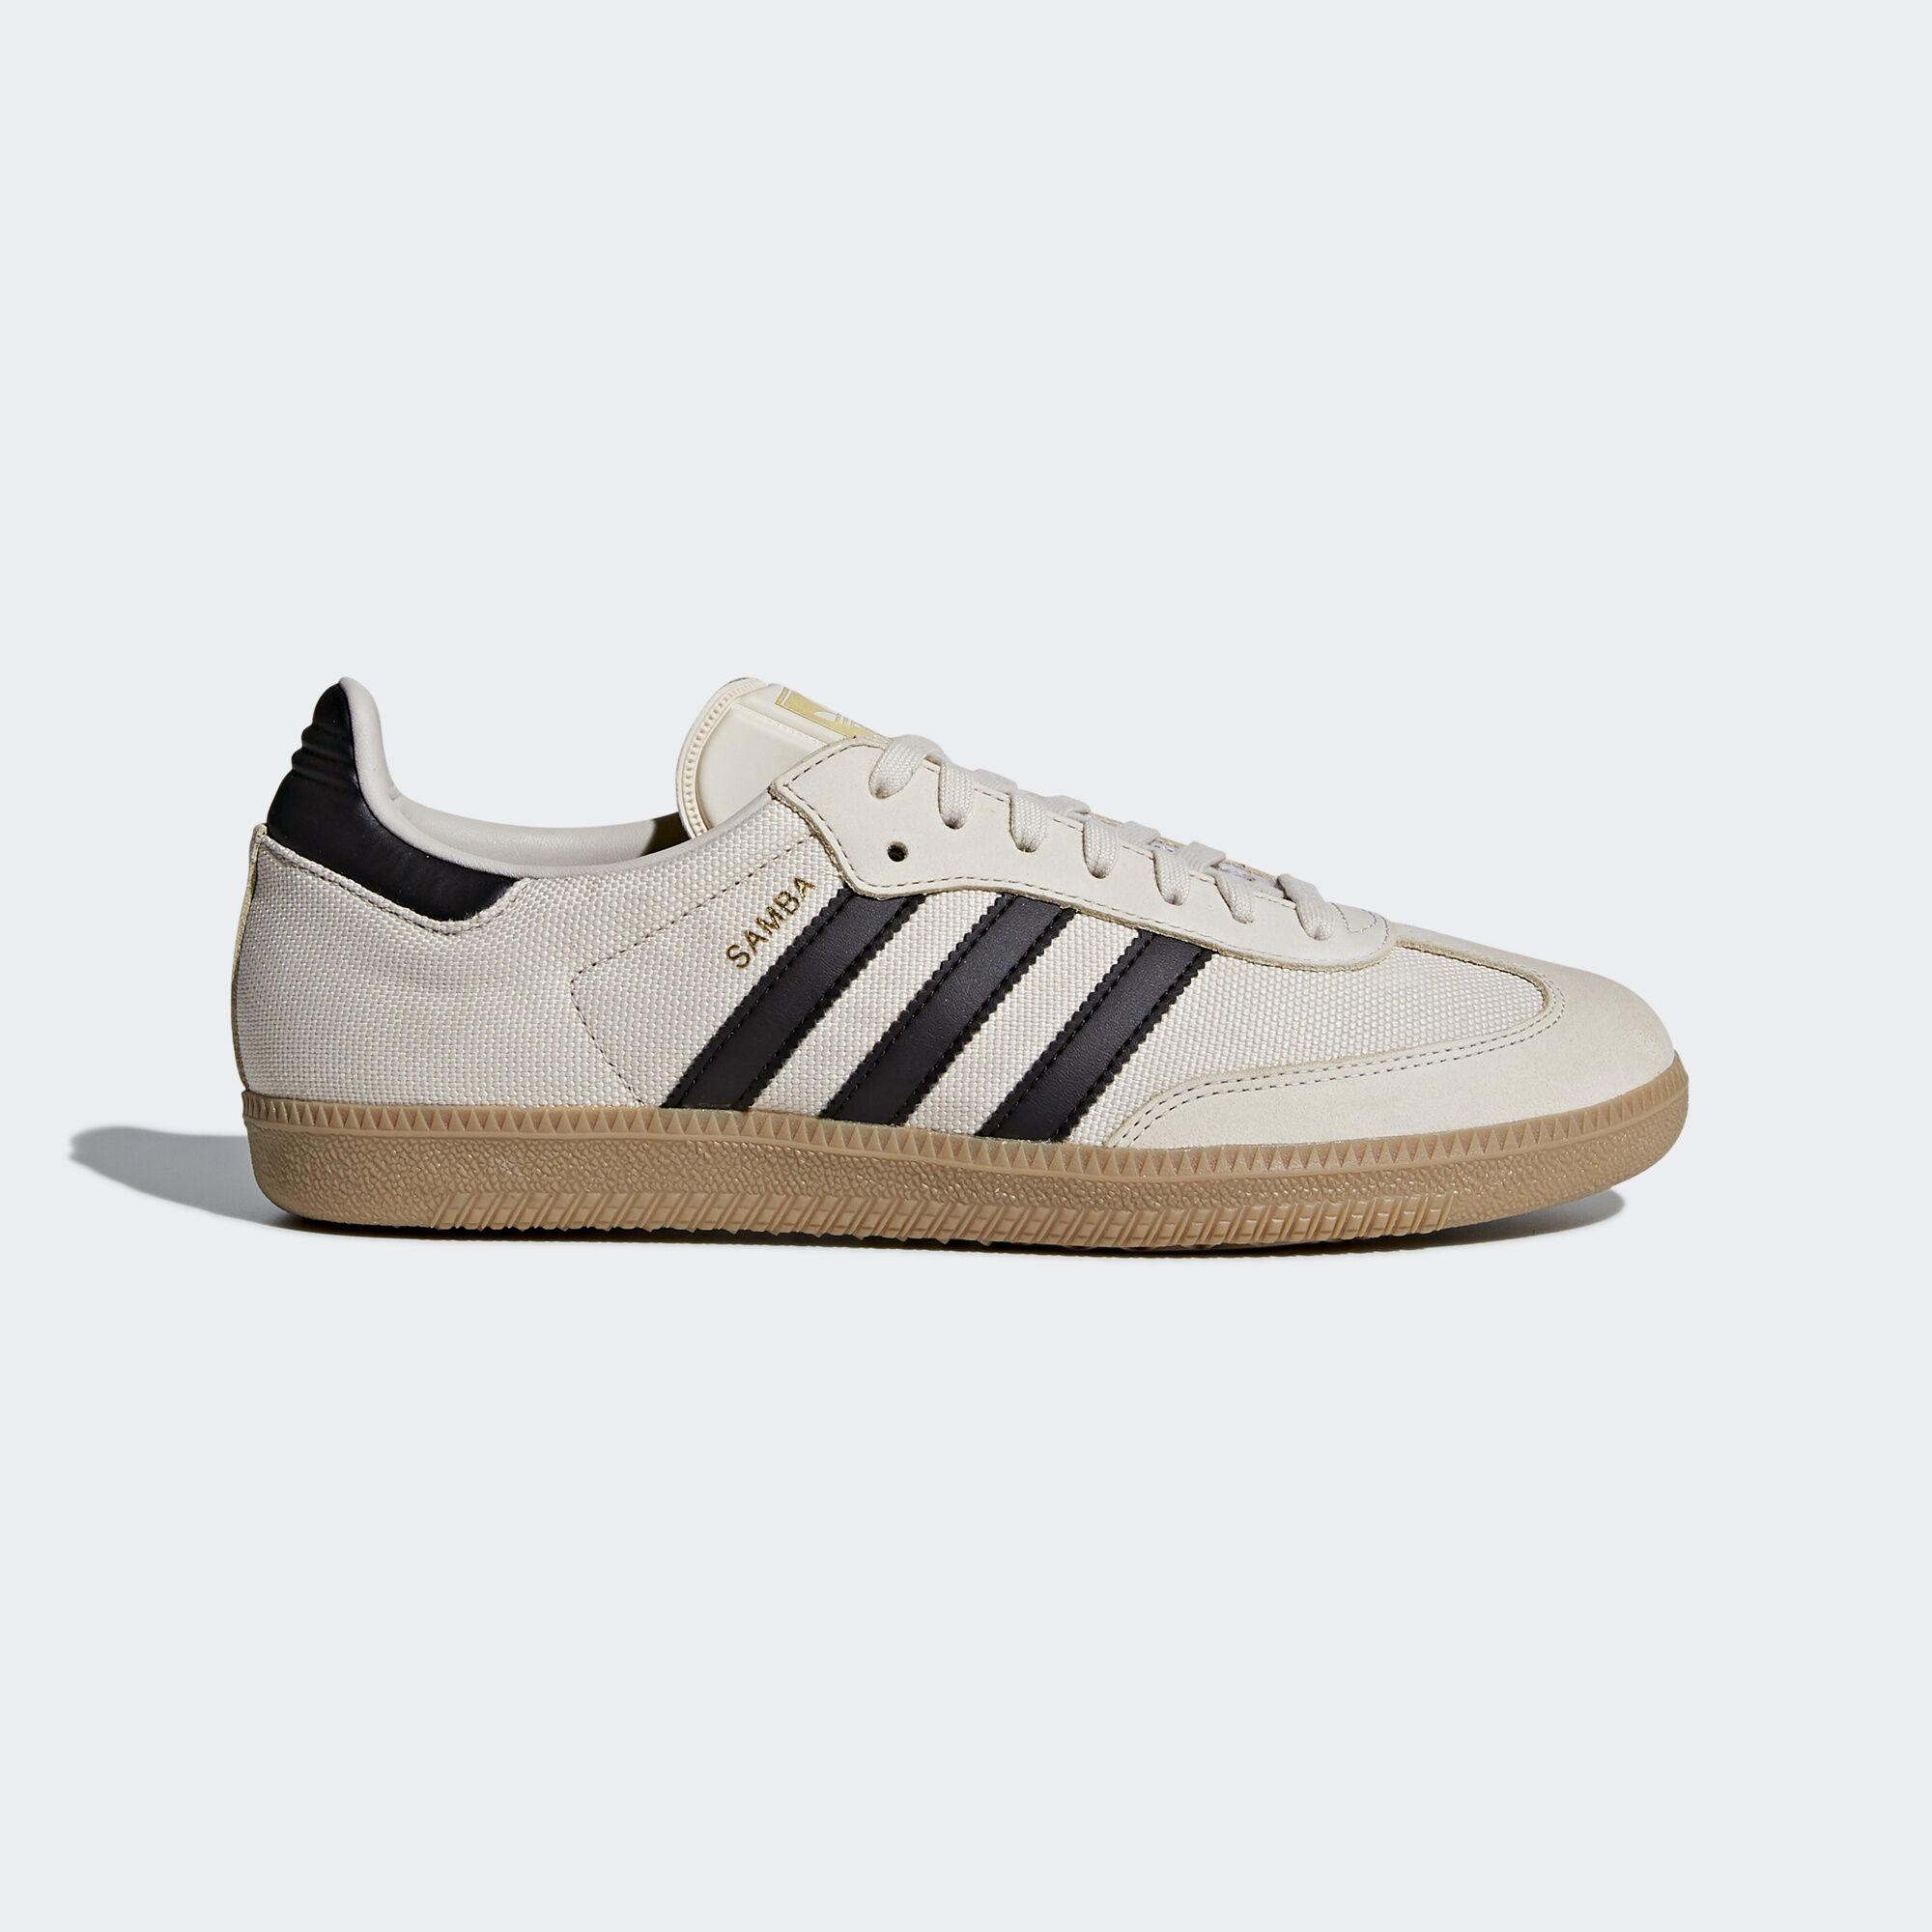 adidas - Samba OG Shoes Clear Brown/Core Black/Gum 4 CQ2151. Men Originals